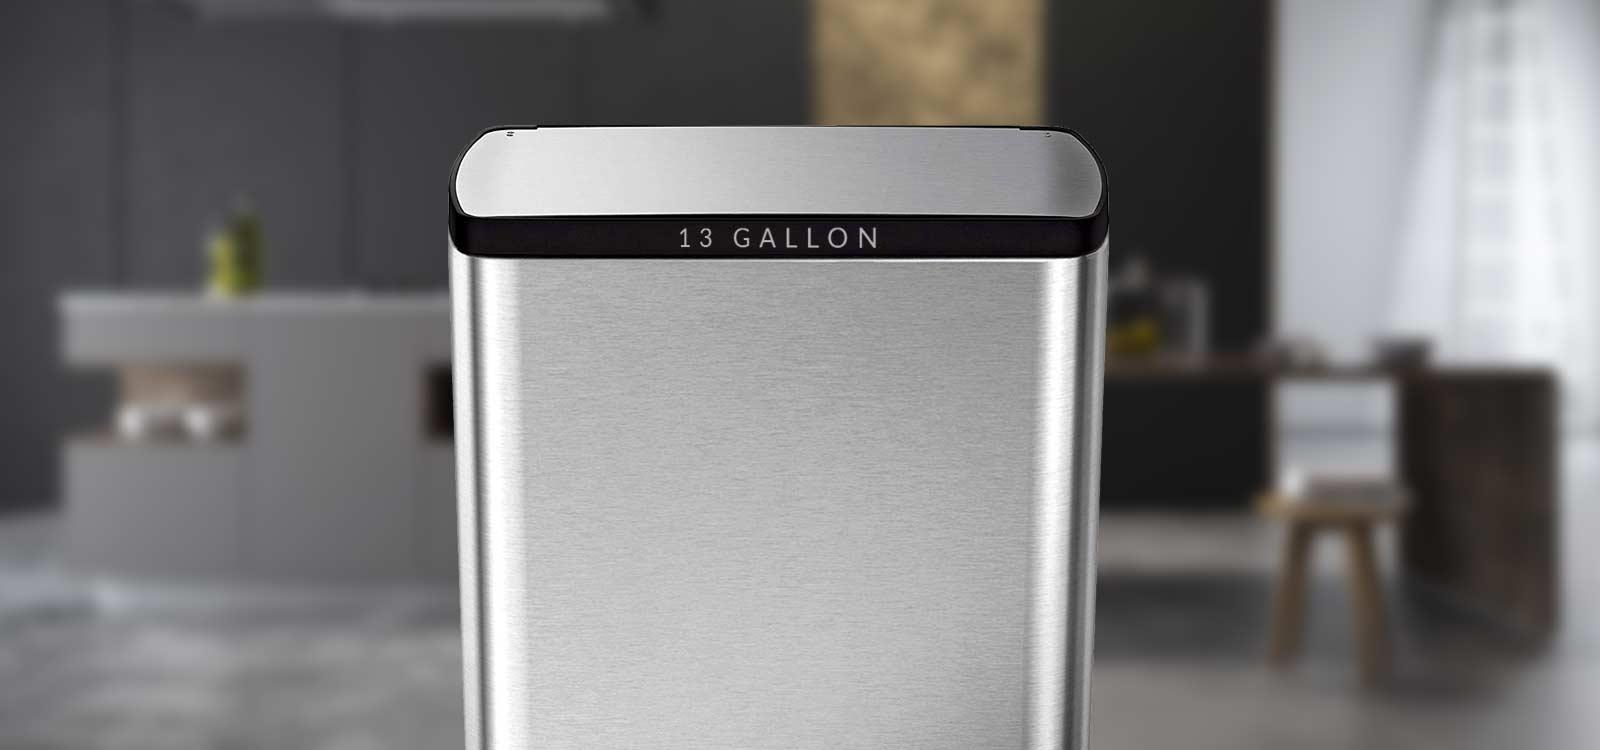 13-gallon-trash-cans-recycle-bin-header